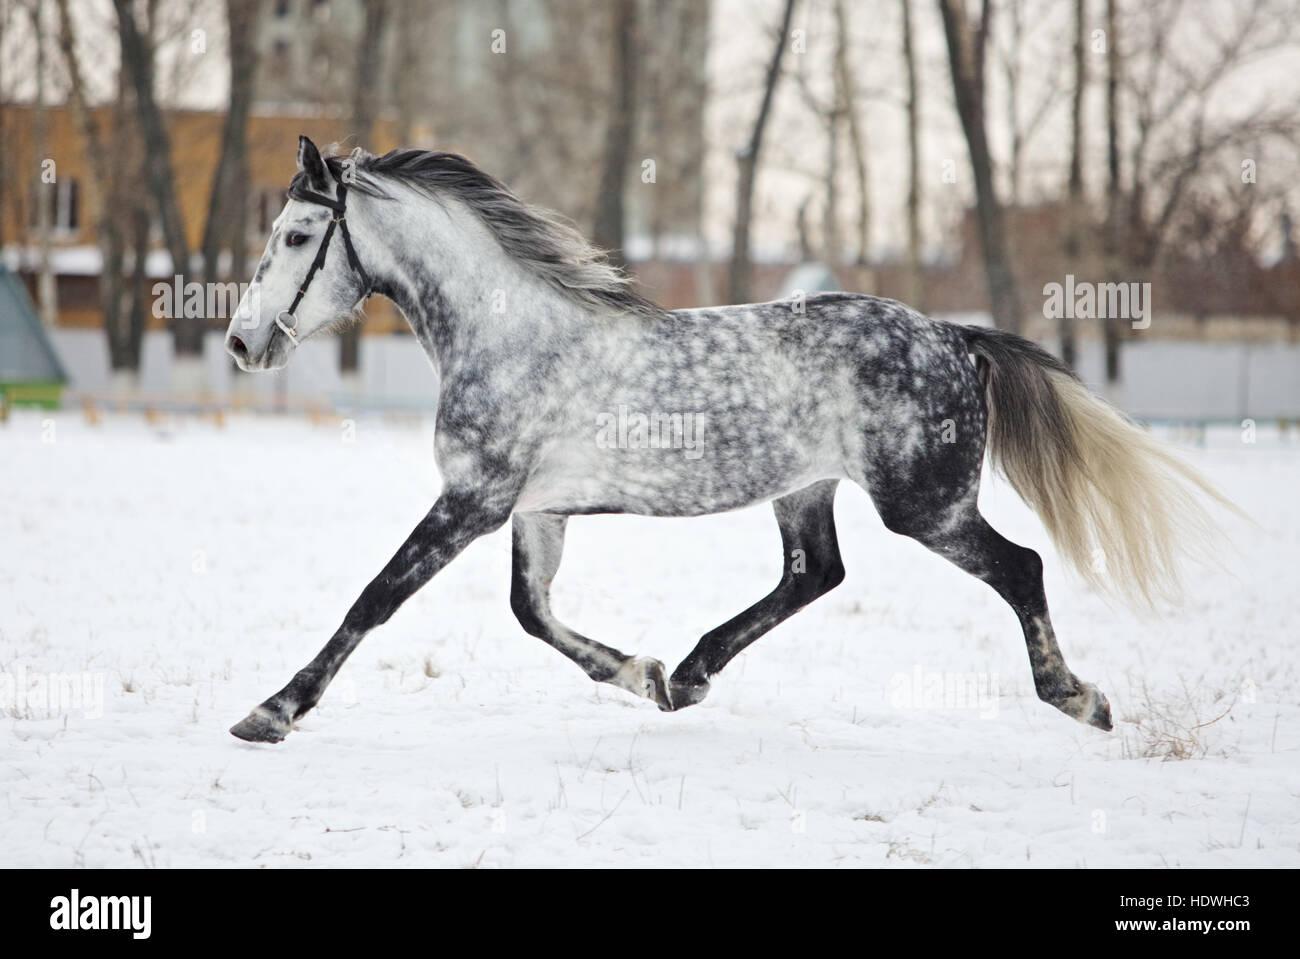 dapplegrey arabian horse in motion on snow field stock